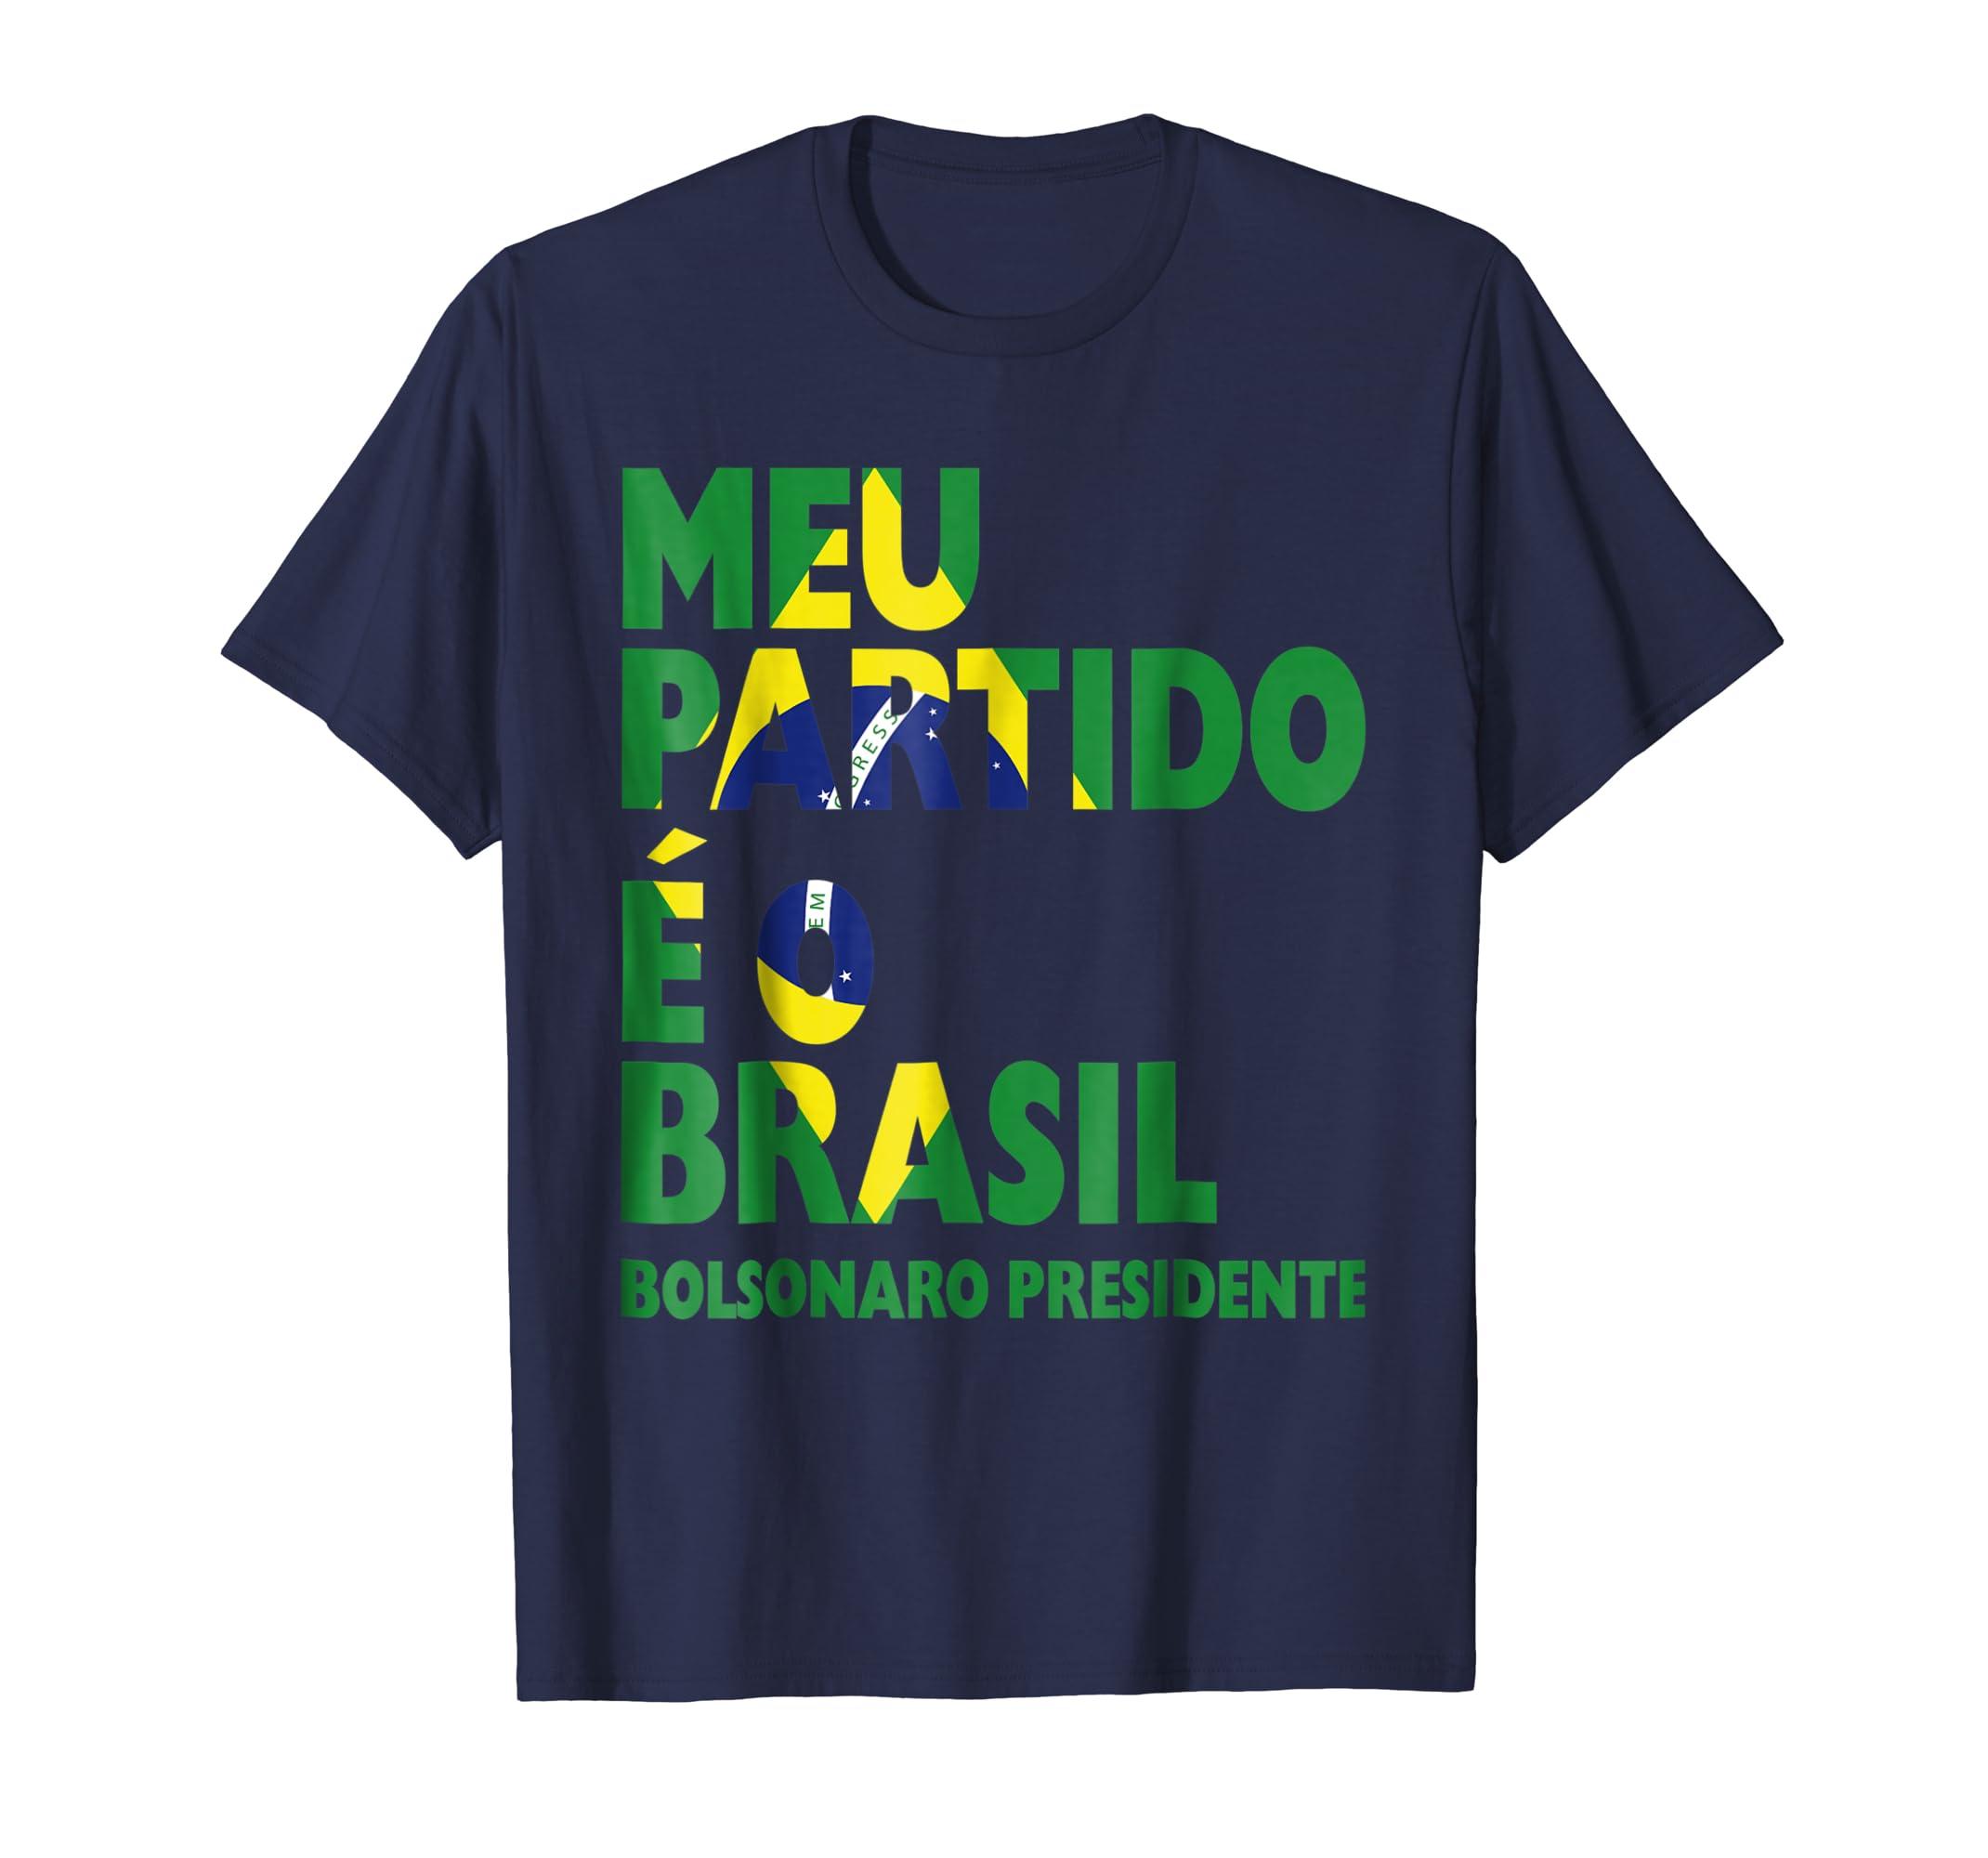 Bolsonaro Presidente 2018 TShirt Camiseta Brazilian Election-ln